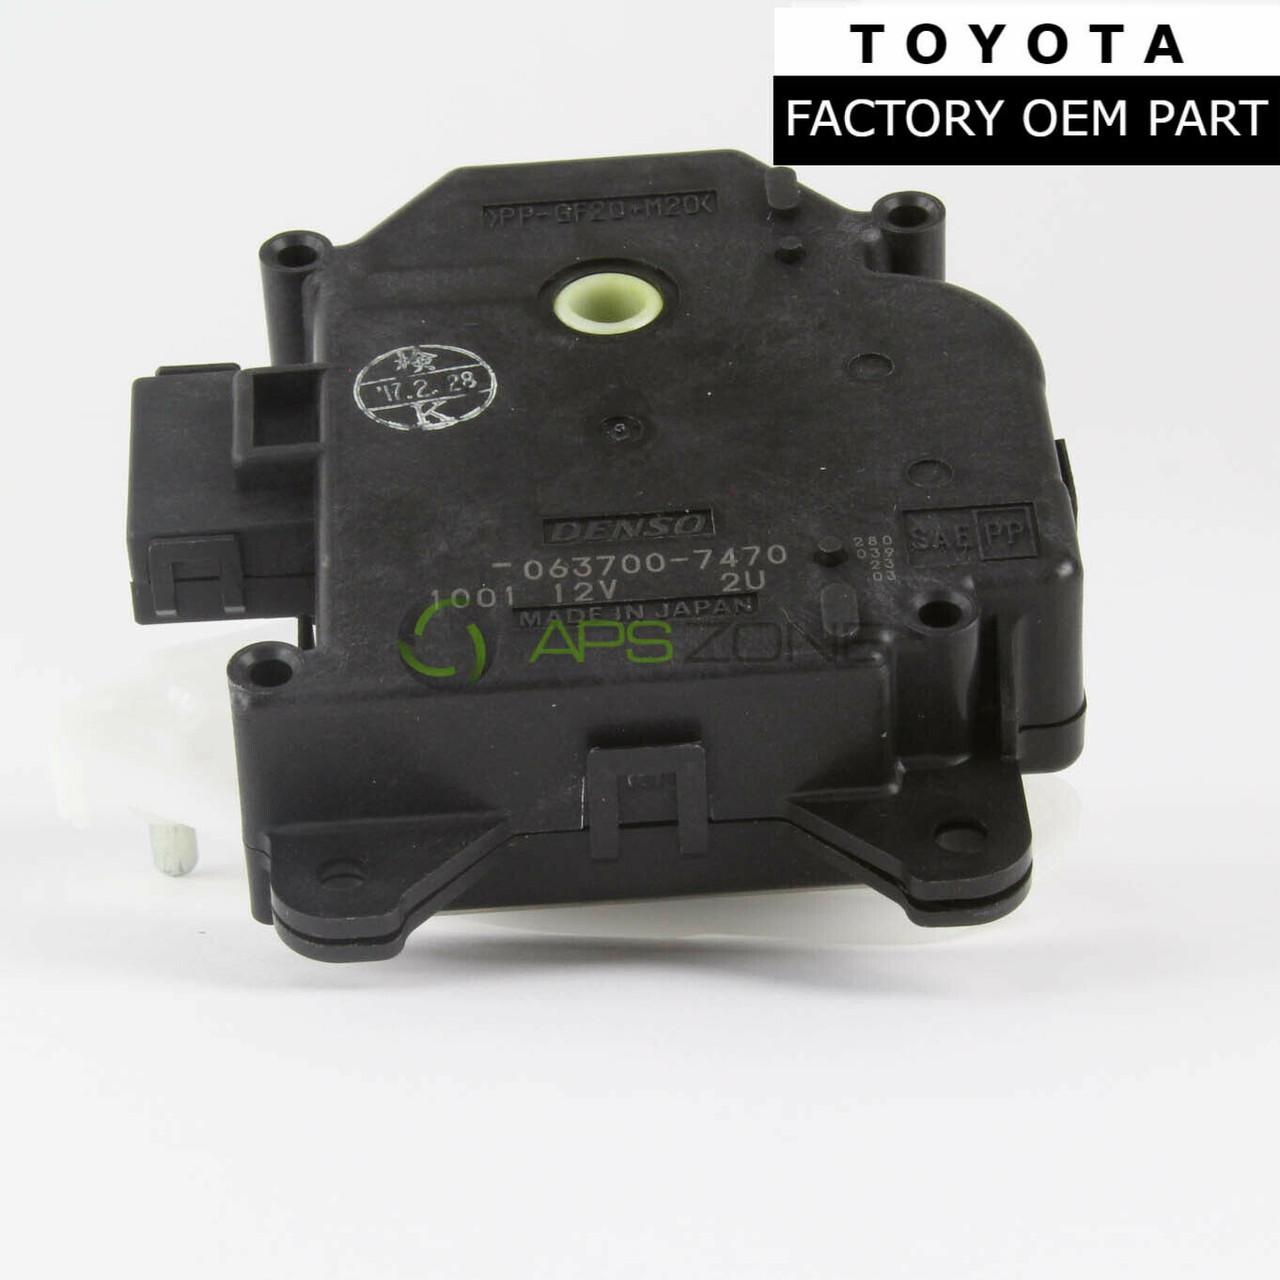 GENUINE LEXUS RX300 IS300 SC430 CLIMATE CONTROL DAMPER SERVO OEM 87106-30371